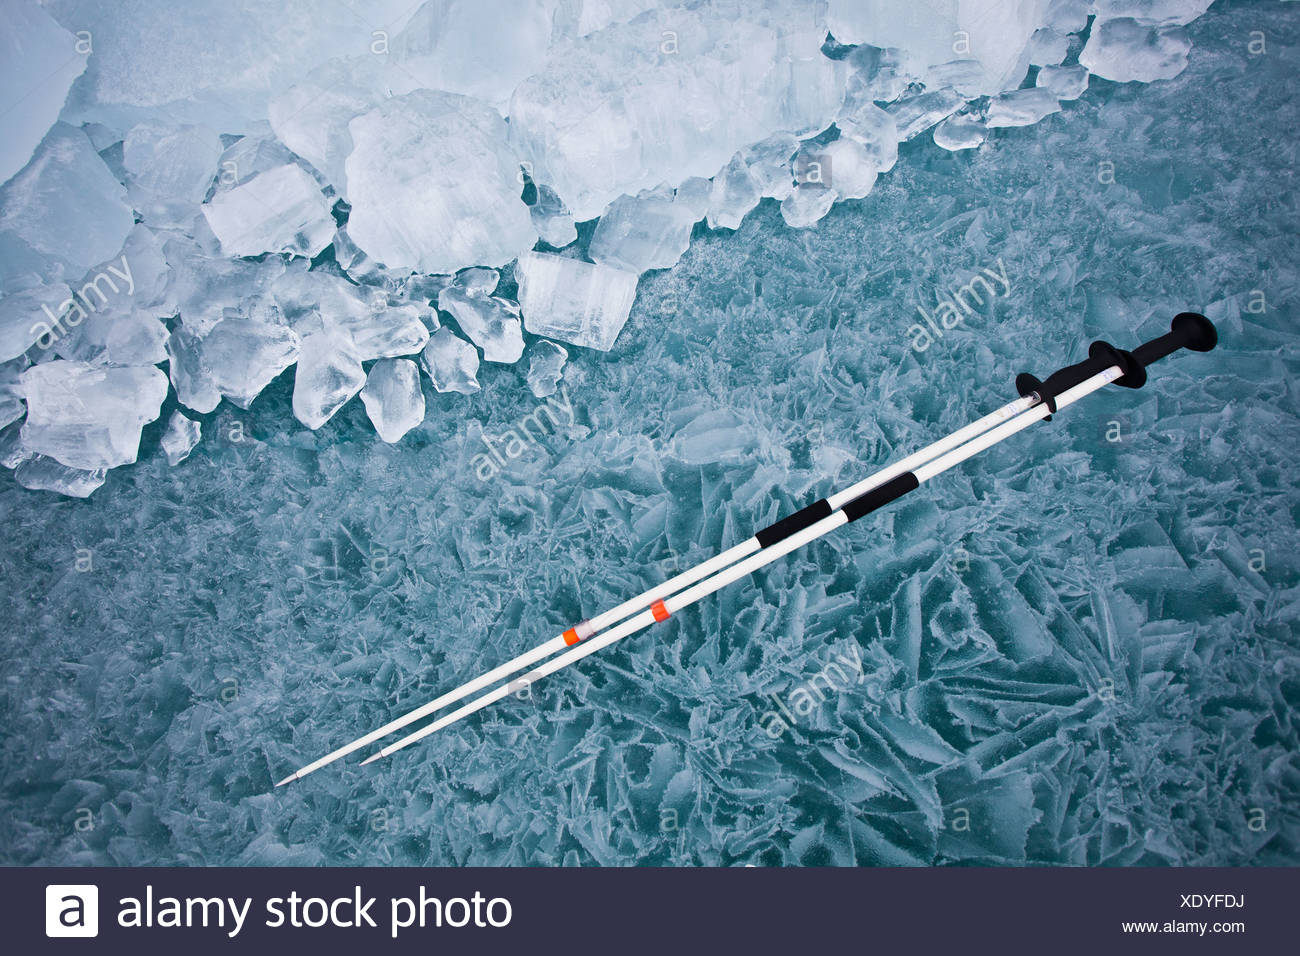 Pair of ski poles on ice rink - Stock Image